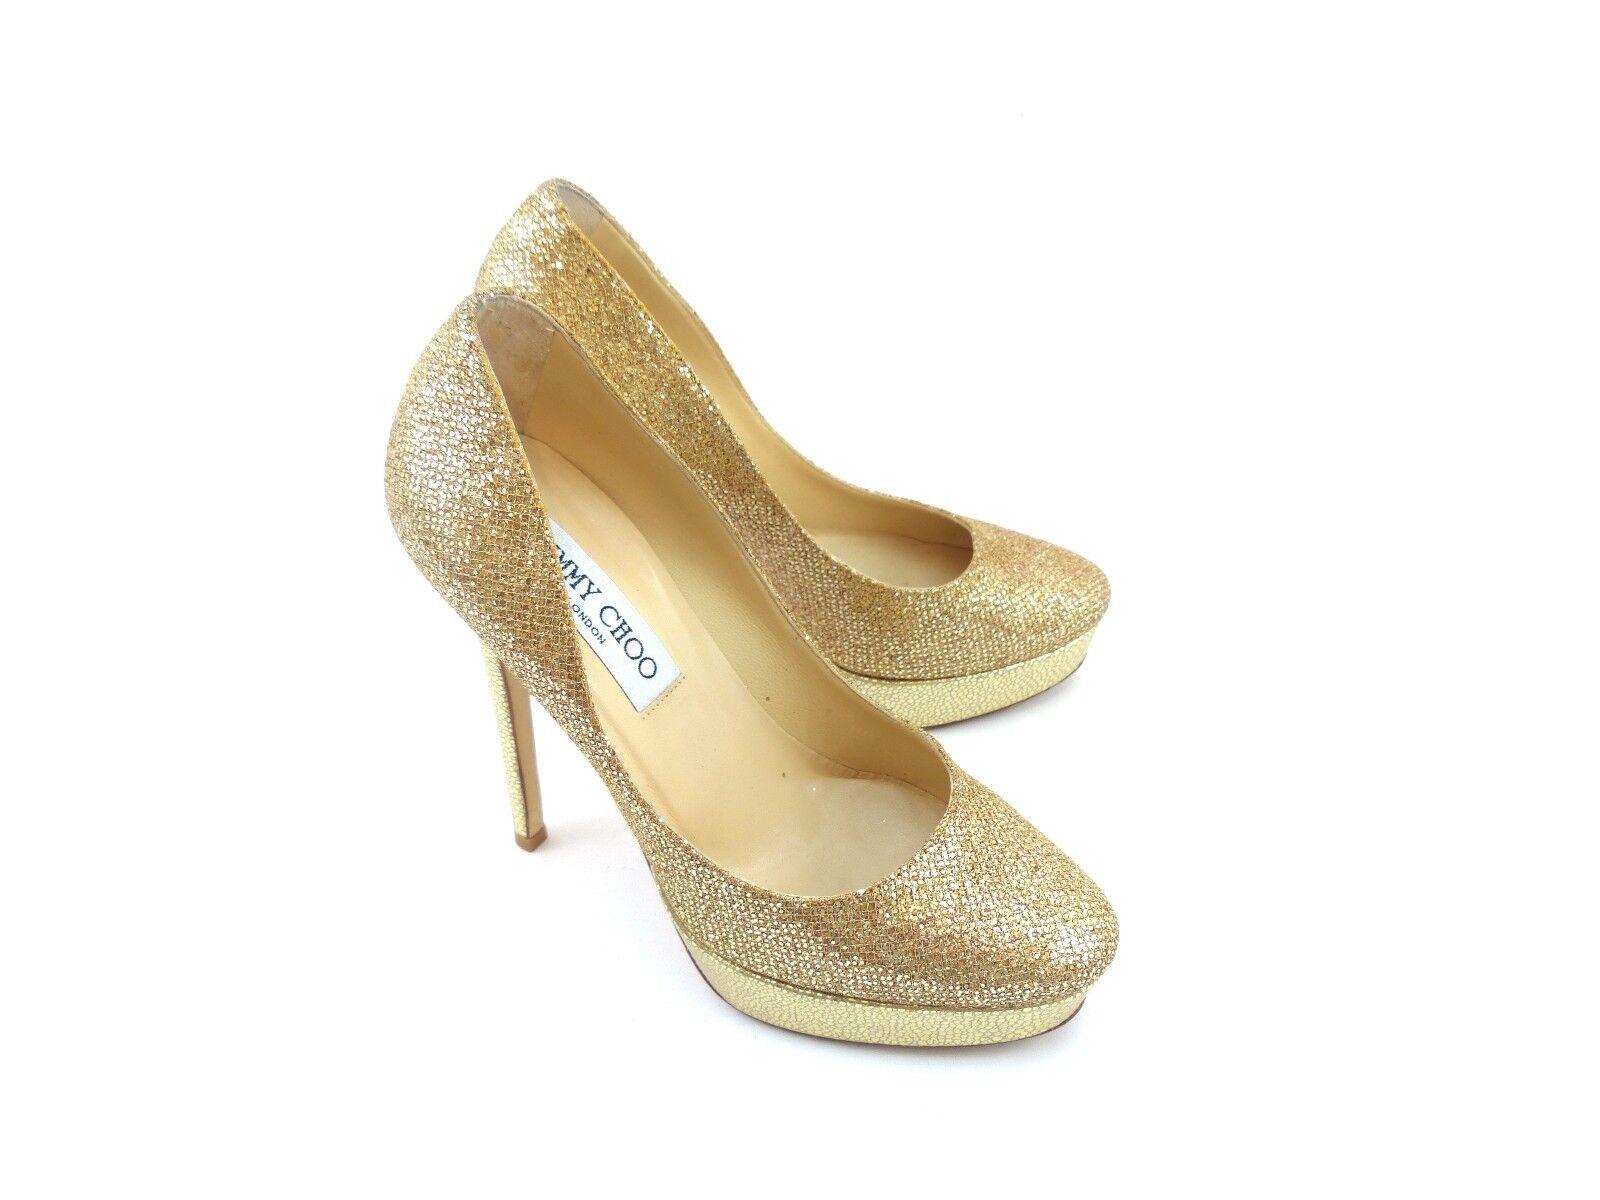 Jimmy Choo Cosmic gold Glitter Fabric [ 44% OFF RRP ]